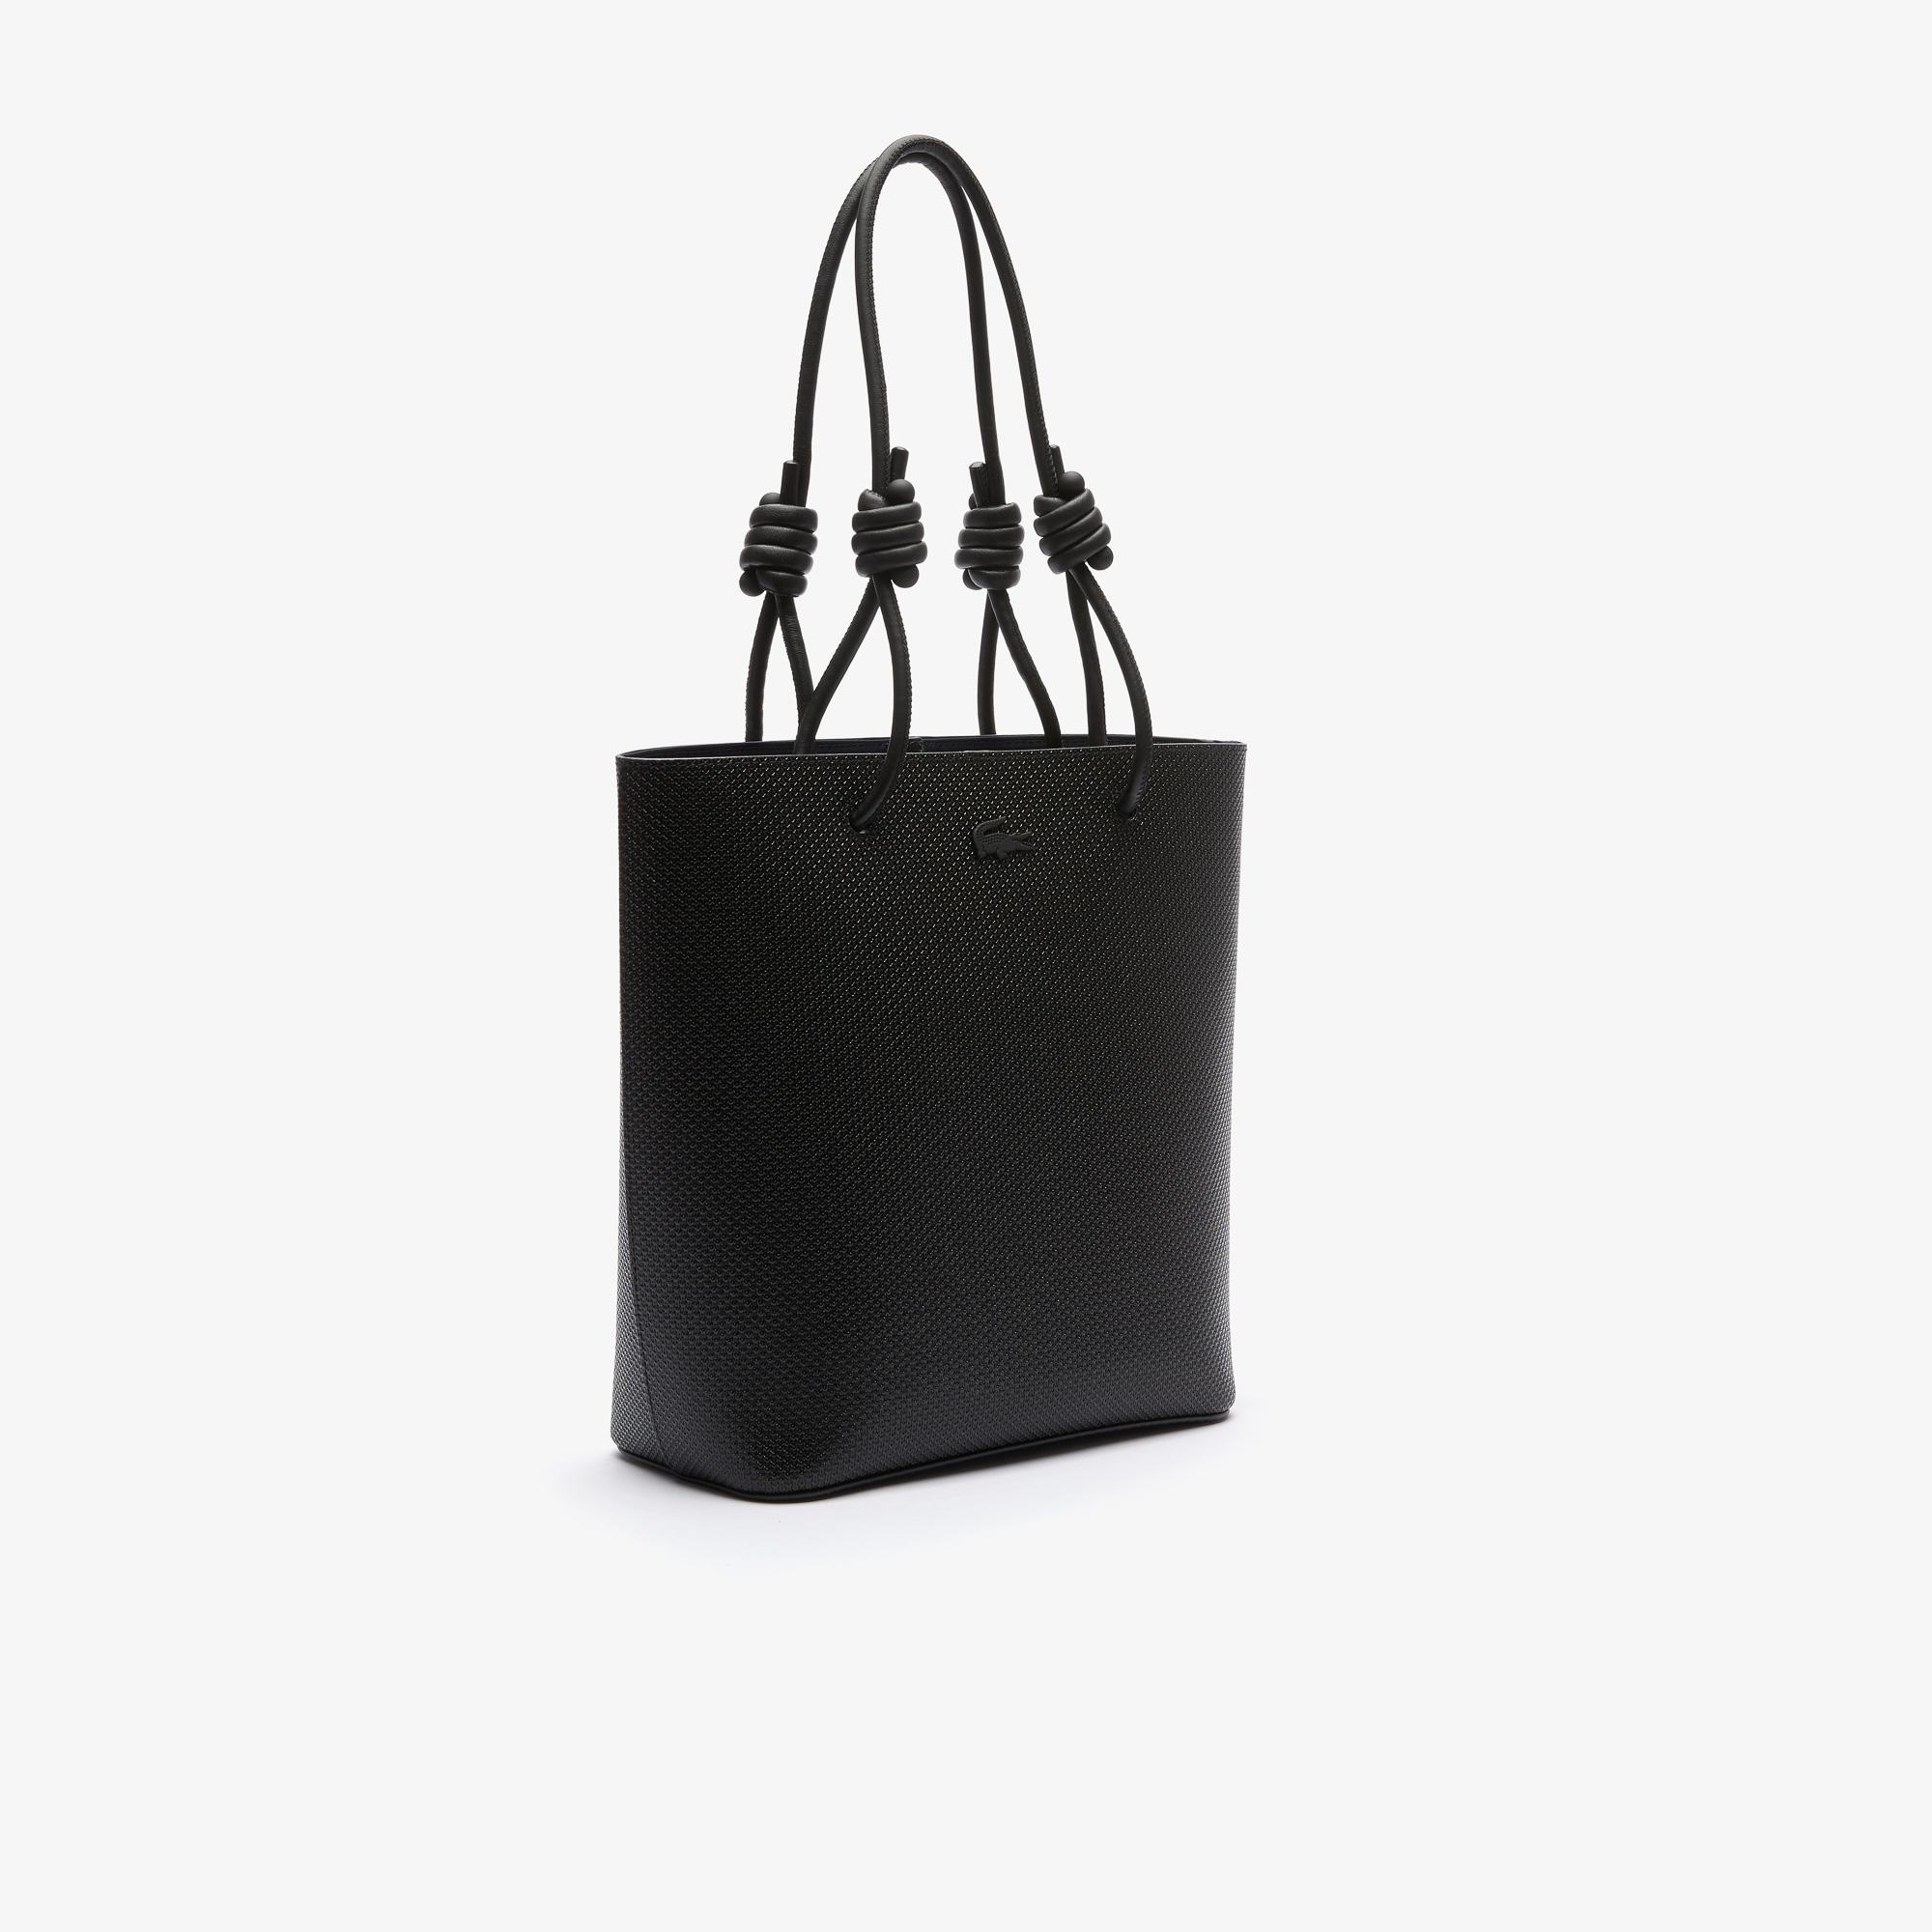 Lacoste сумка жіноча Chantaco